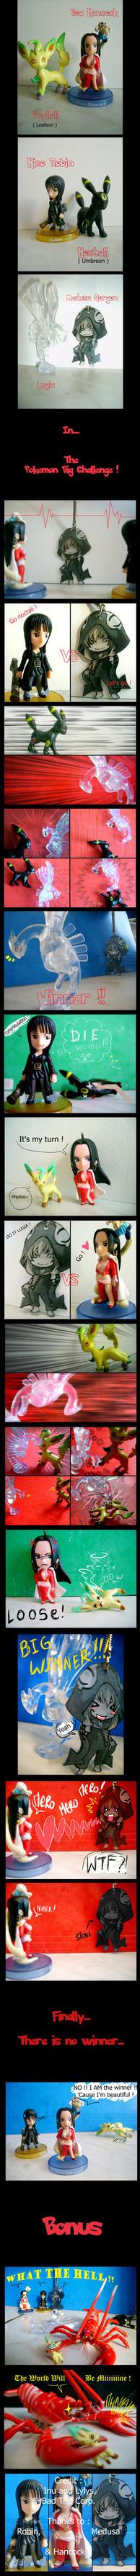 The Pokemon Big Challenge by inu-steakcy